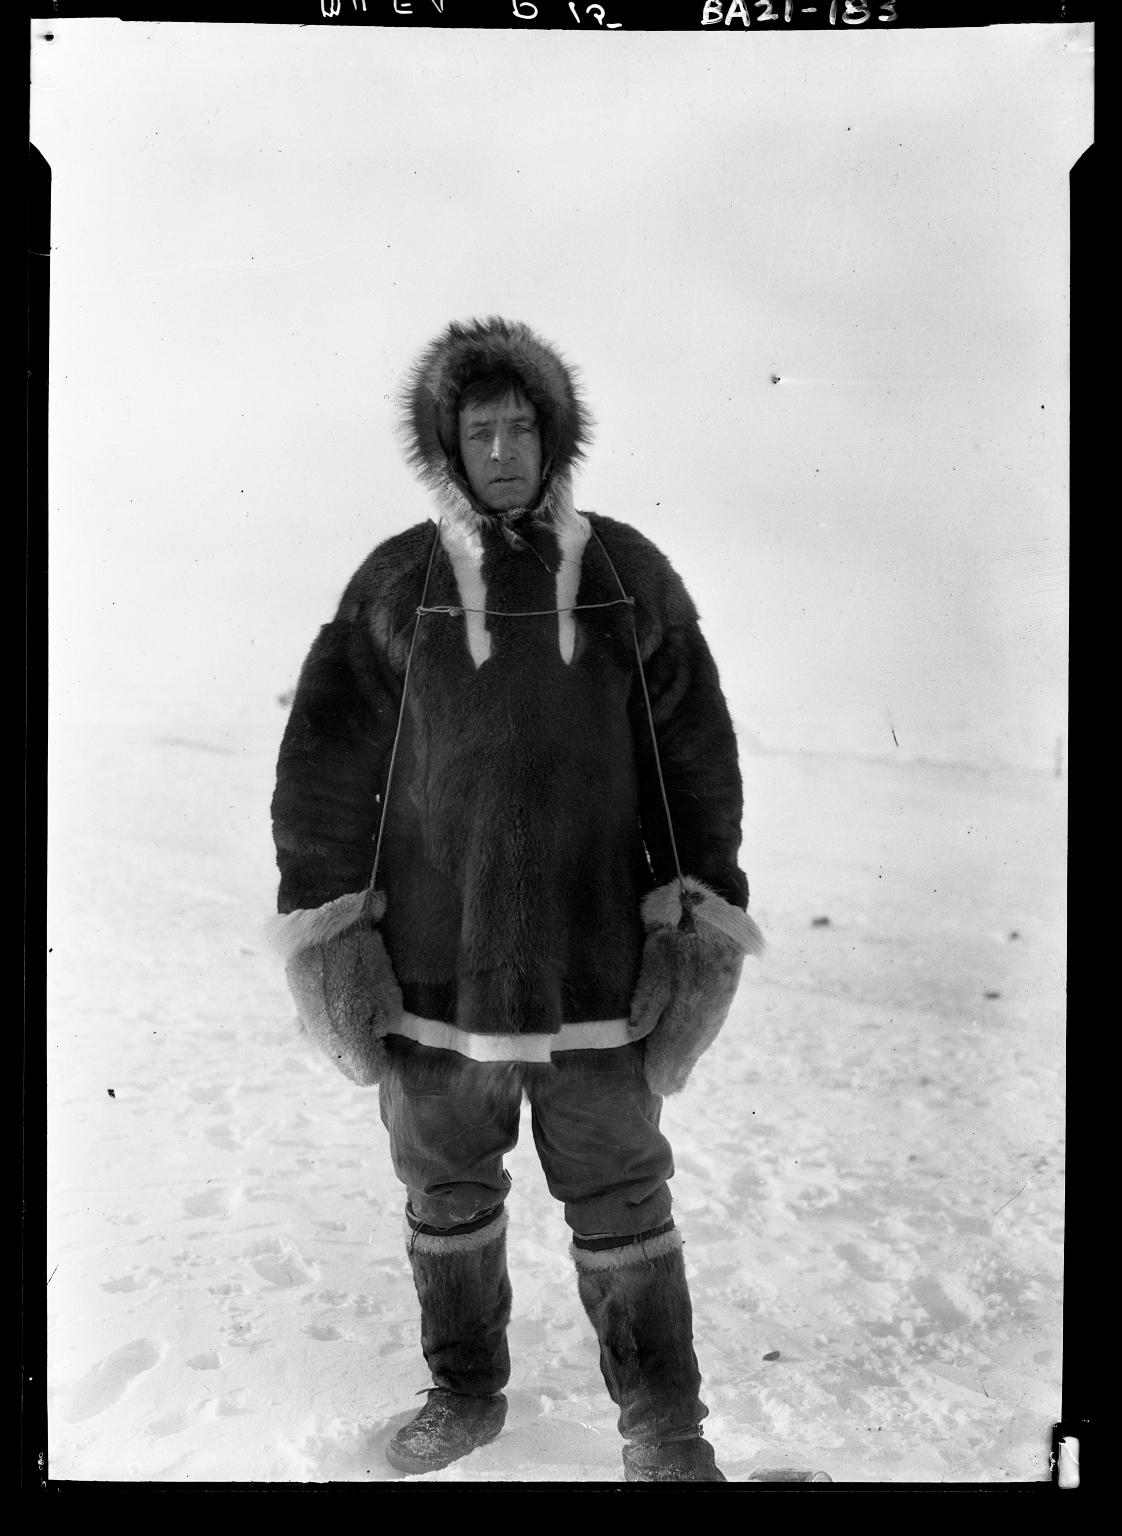 Jim Allen in Wainwright, Alaska